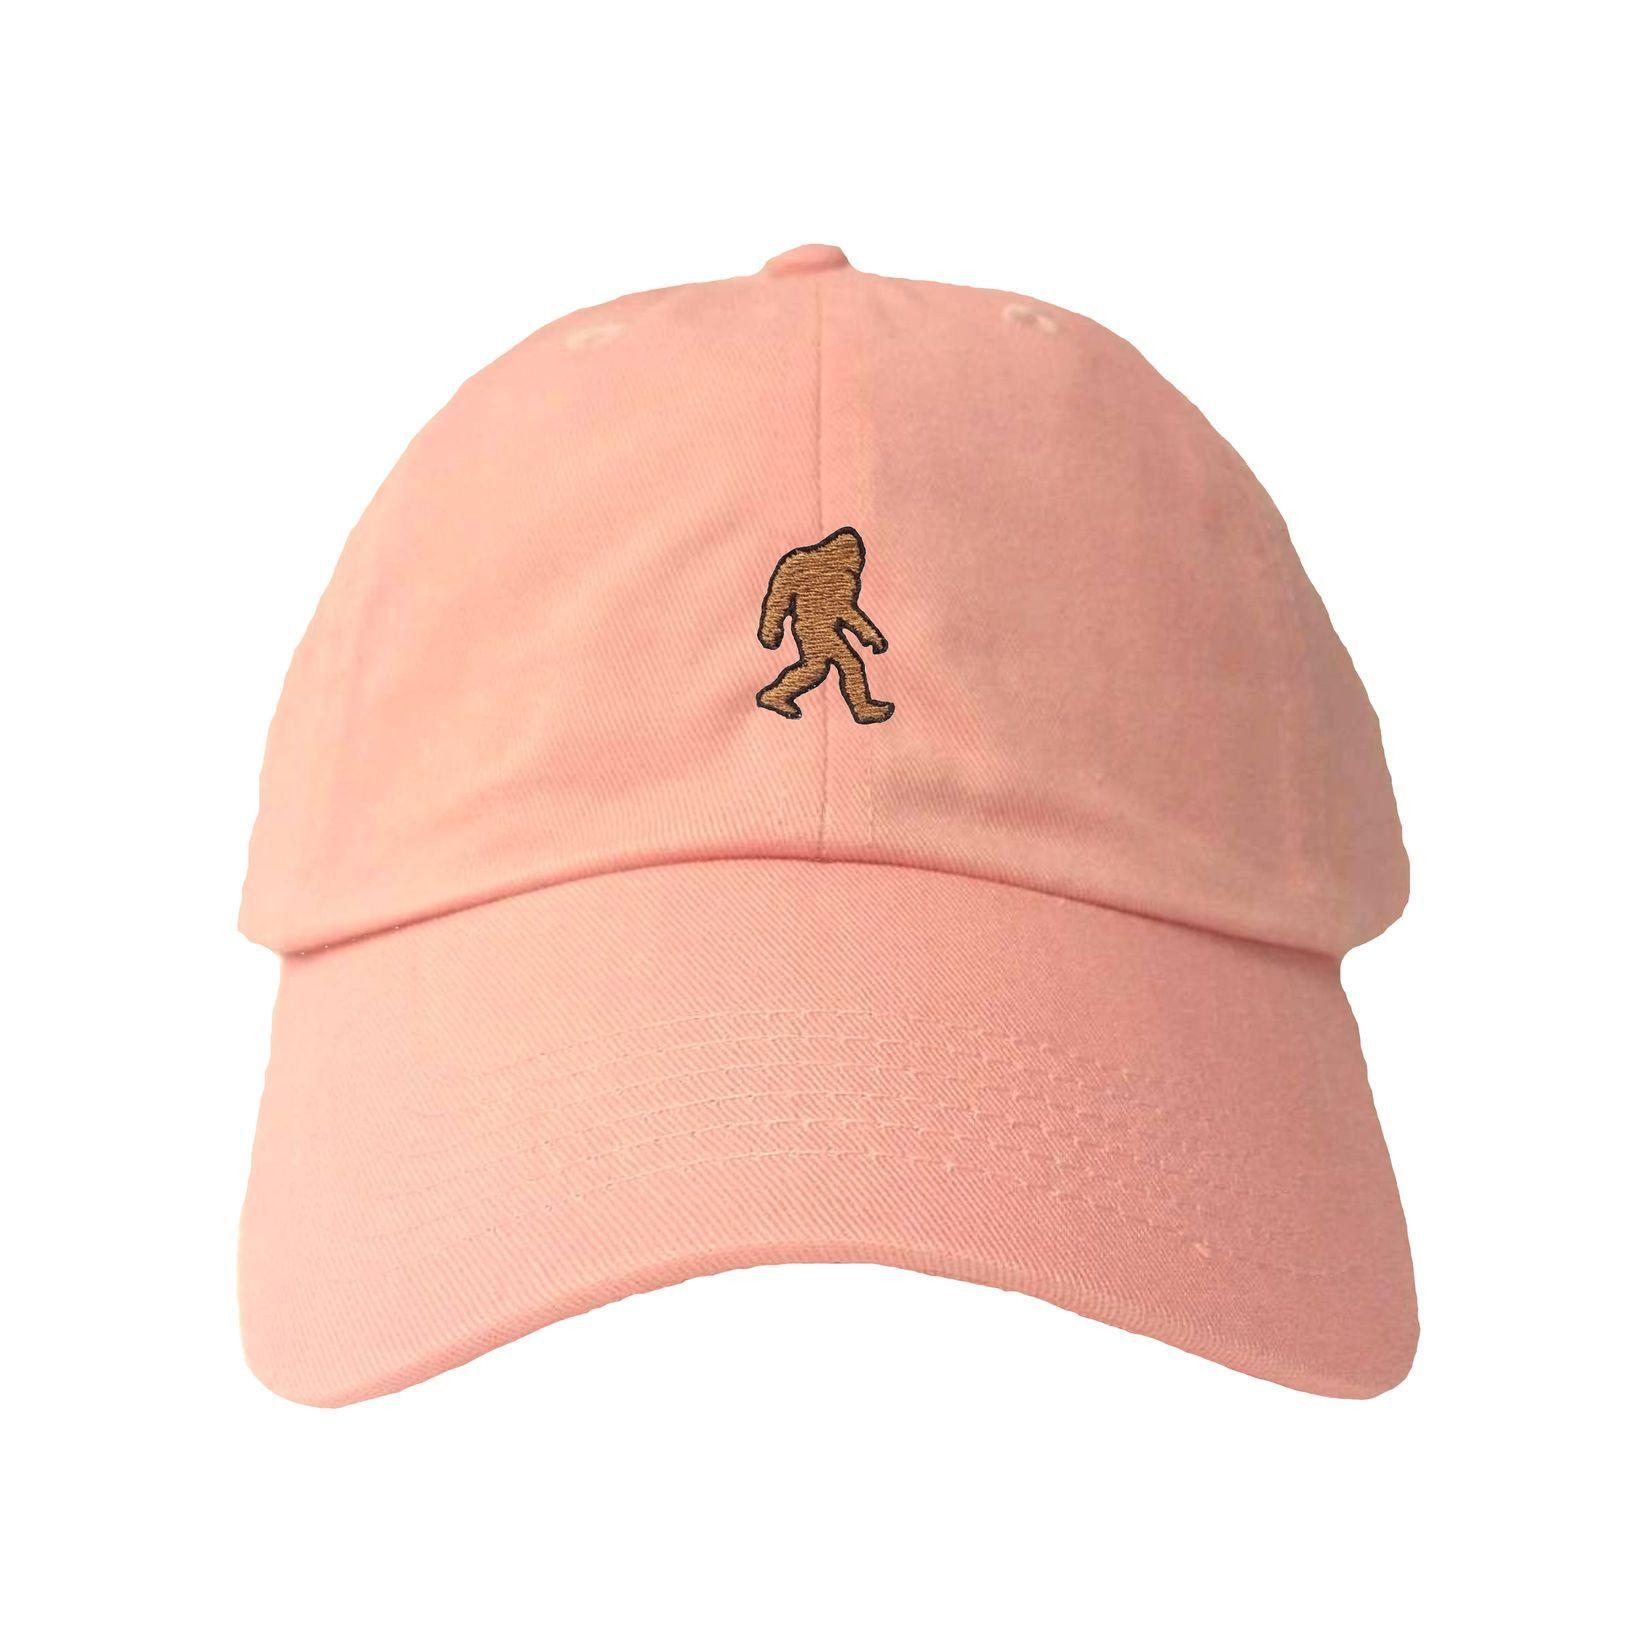 Adult Bigfoot Sasquatch Embroidered Dad Hat Cap 9daa7924592